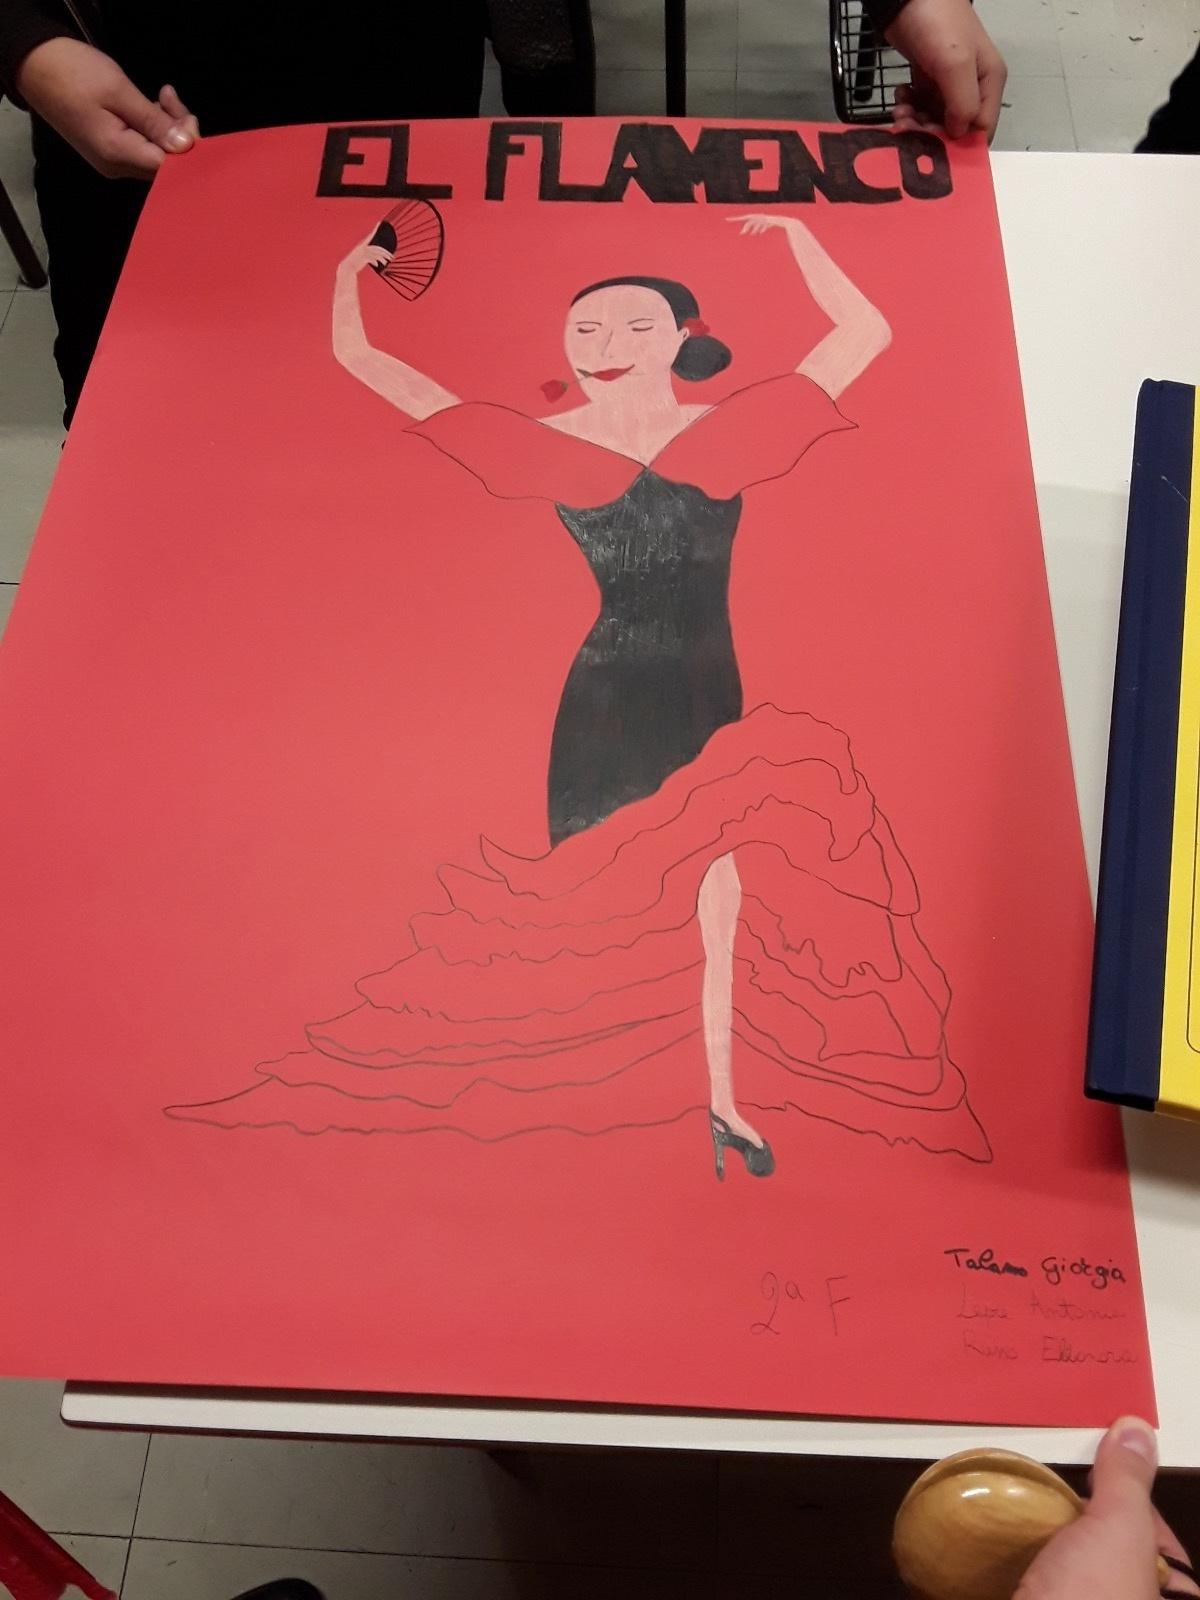 A lezione di flamenco